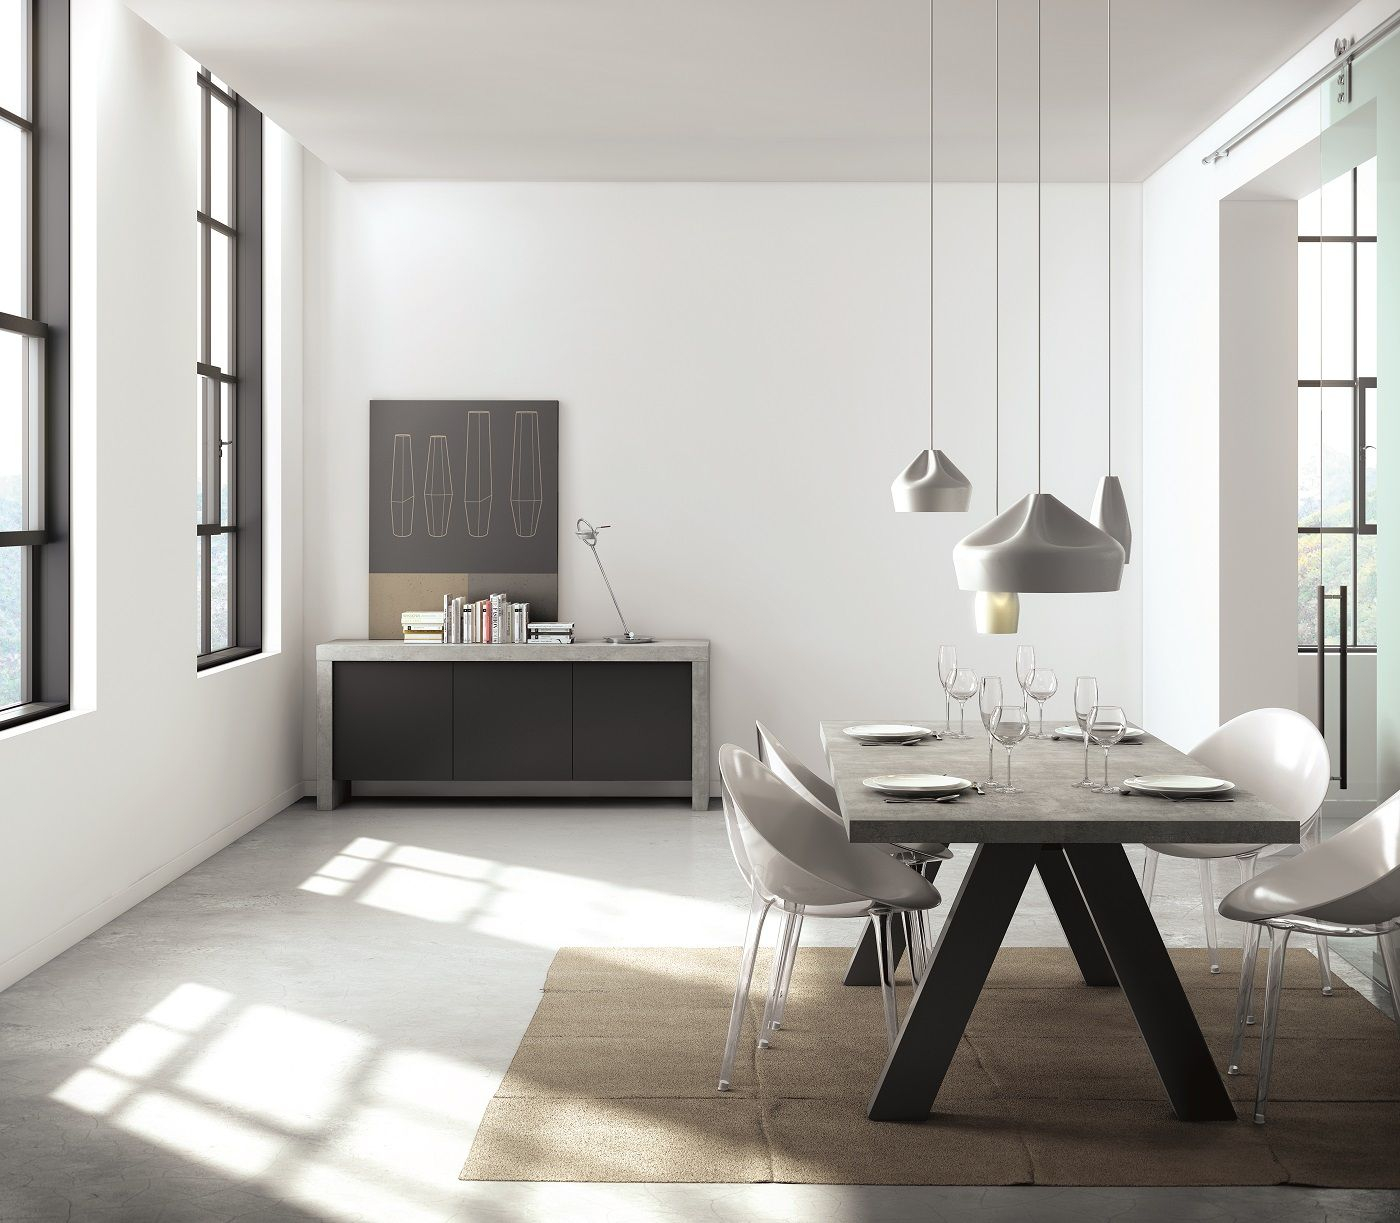 Temahome - Apex Spisebord - Grå Beton-look 200x100 - Spisebord i gråt beton-look